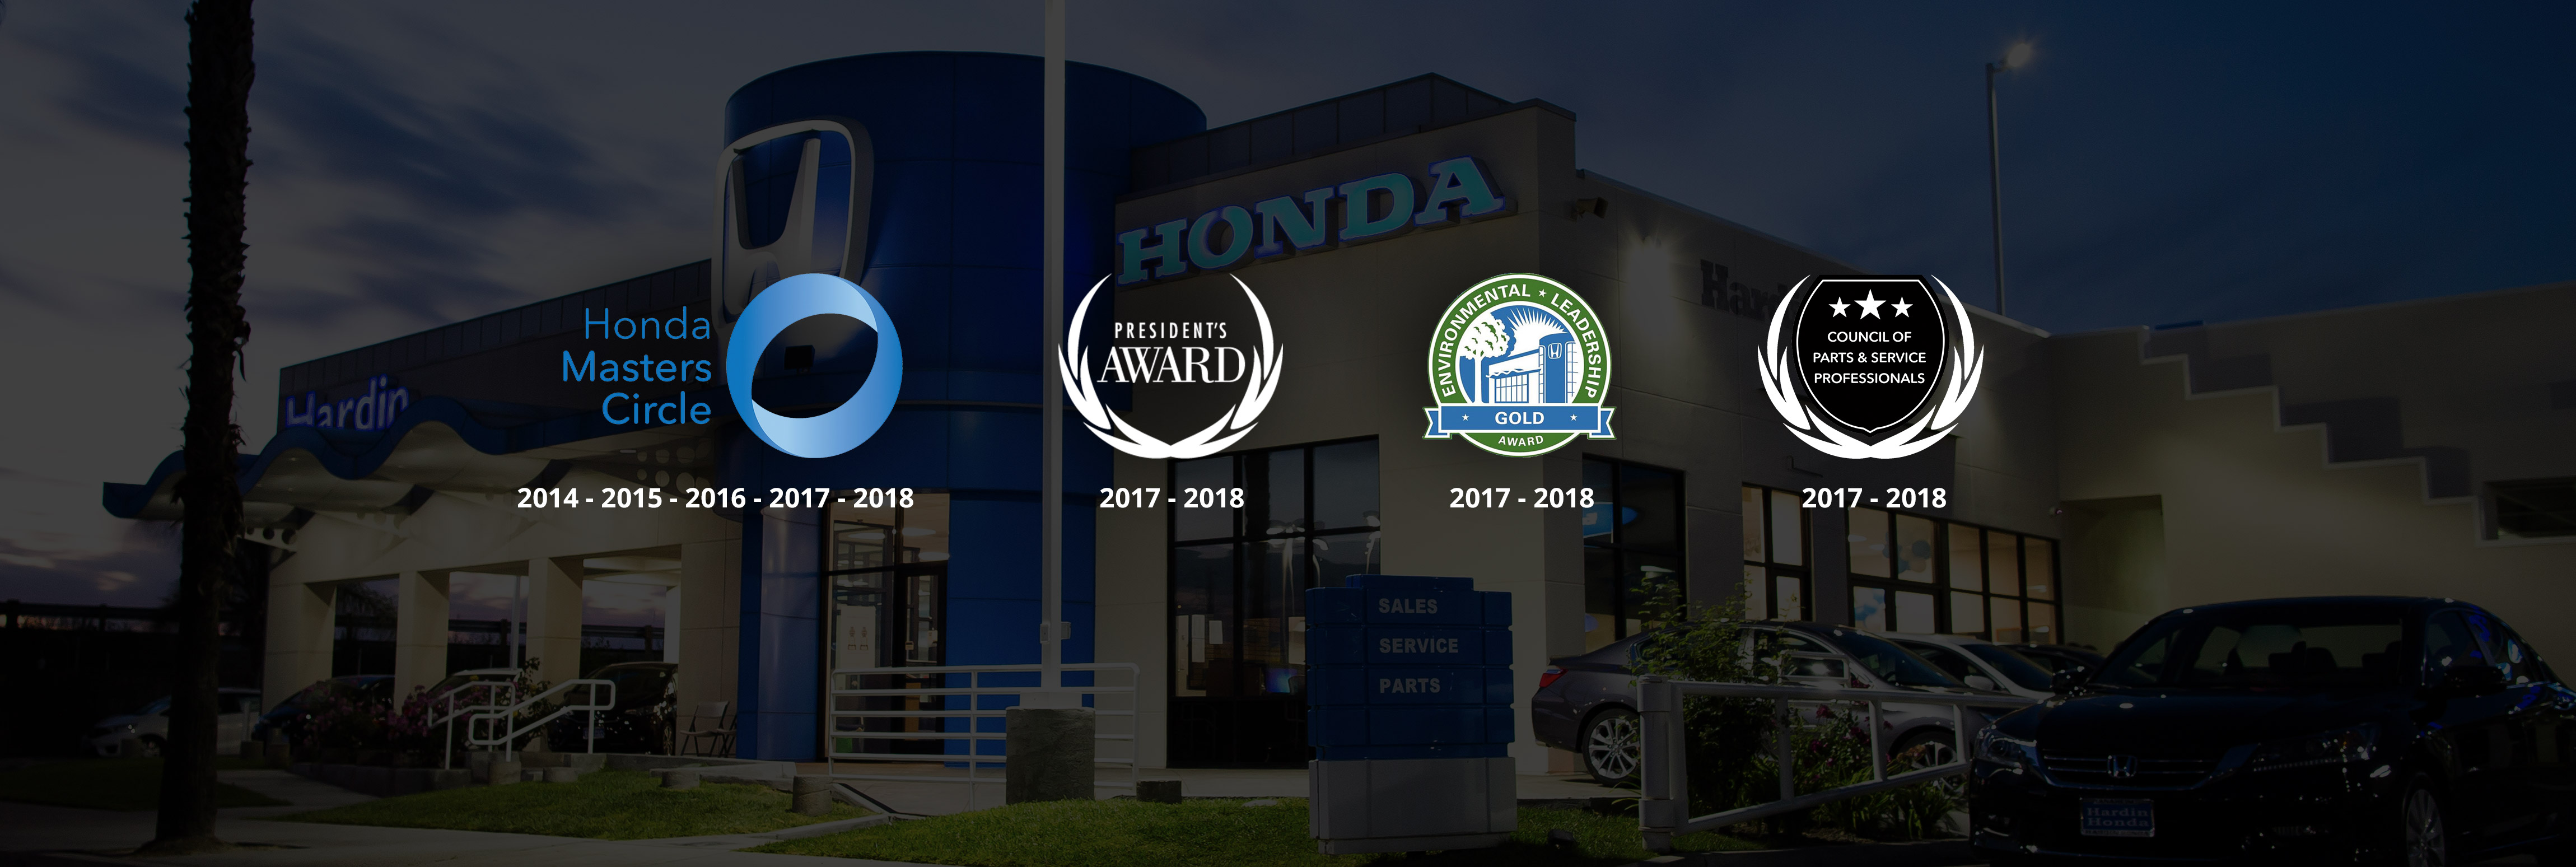 Honda Dealership Orange County >> Hardin Honda Dealership Serving Anaheim Orange Country